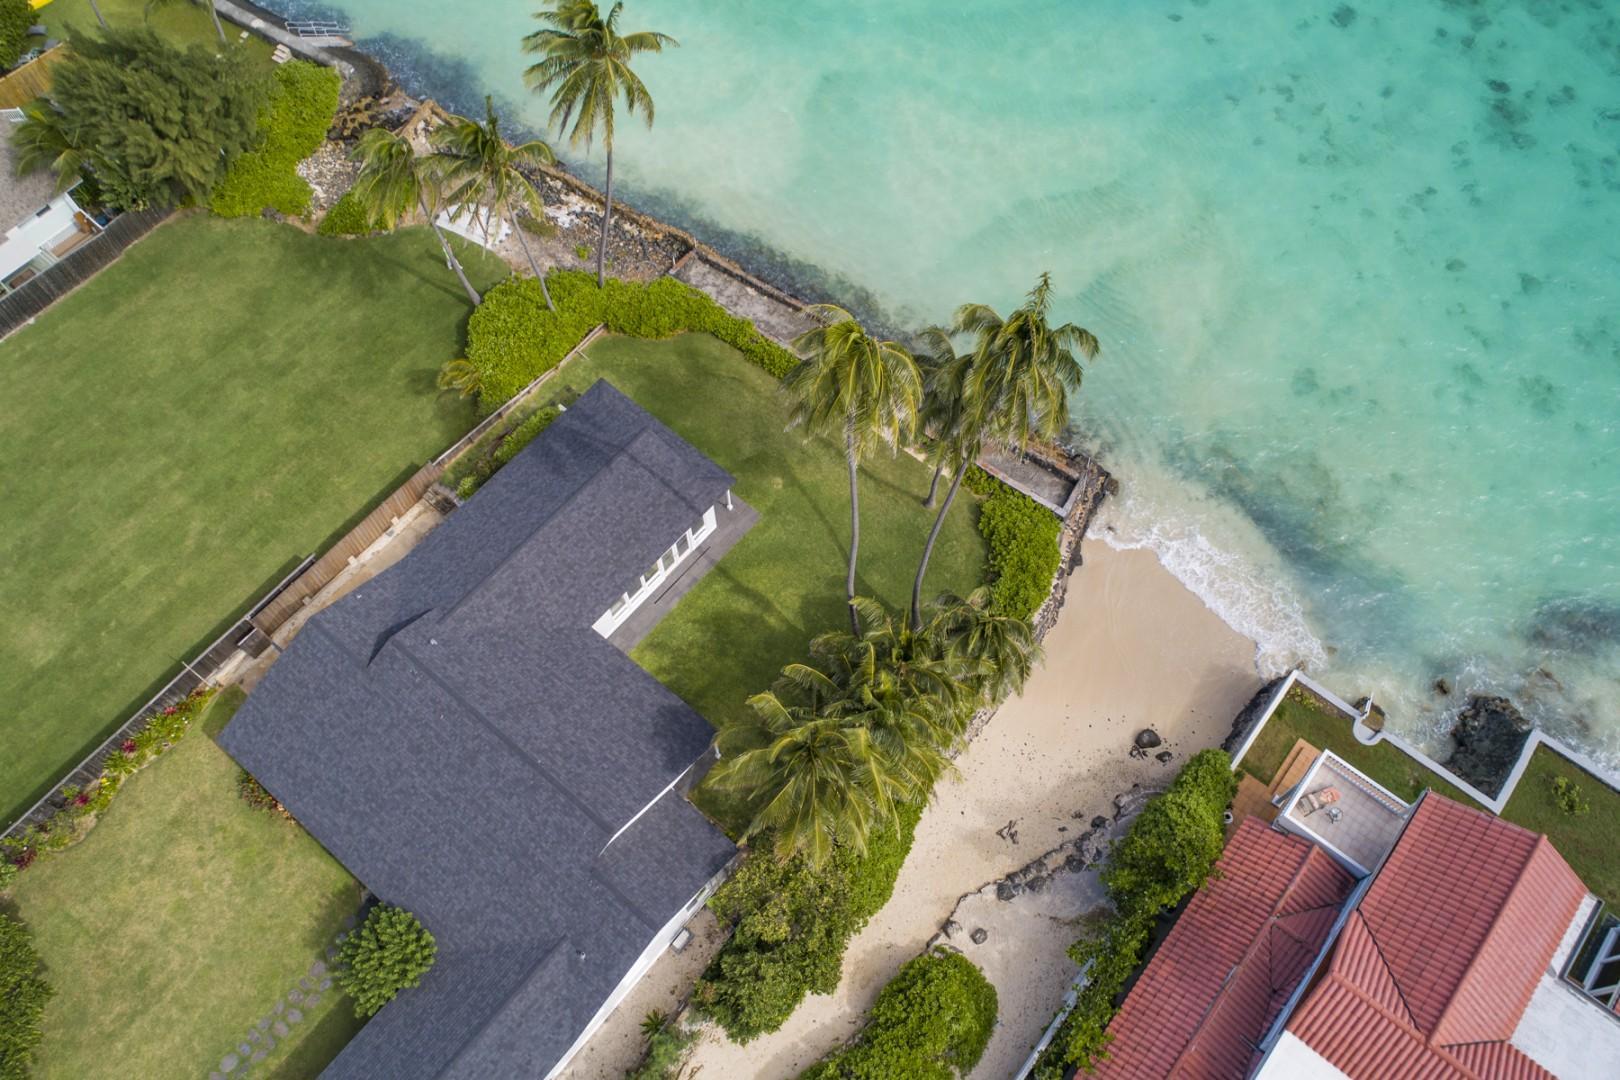 Lanikai Oceanside sits adjacent to a public beach access